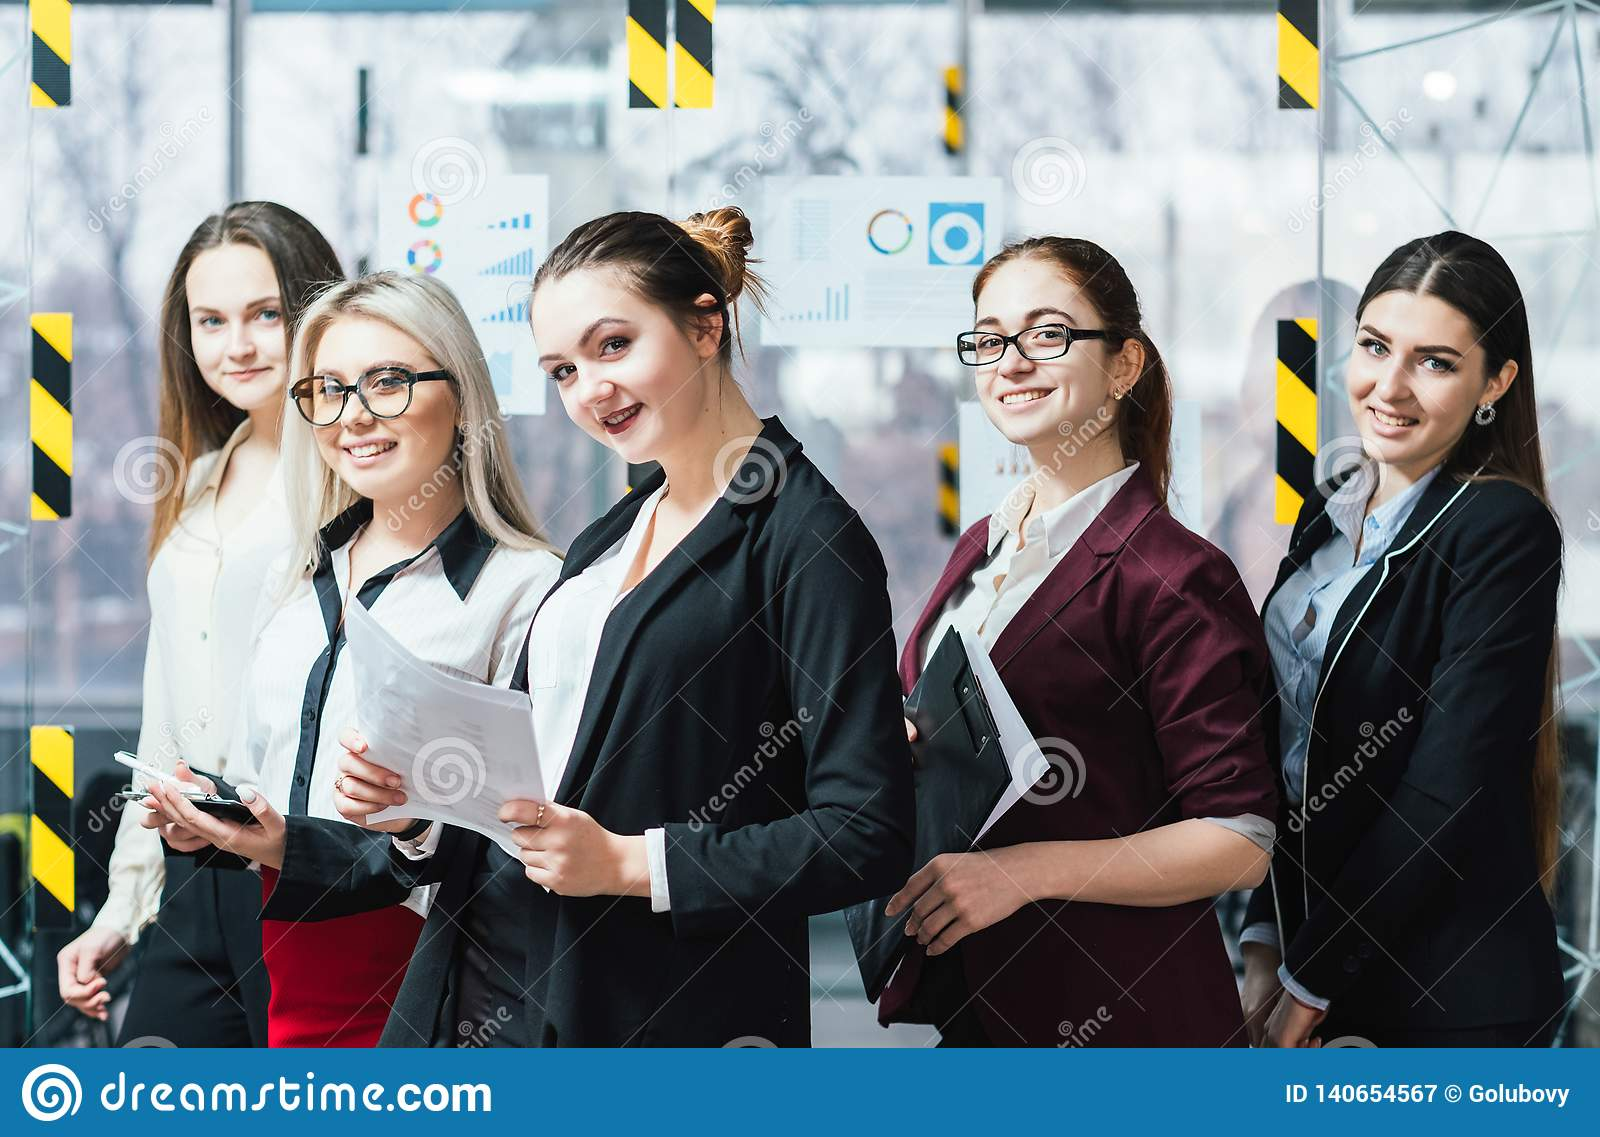 Successful business women confidence workspace